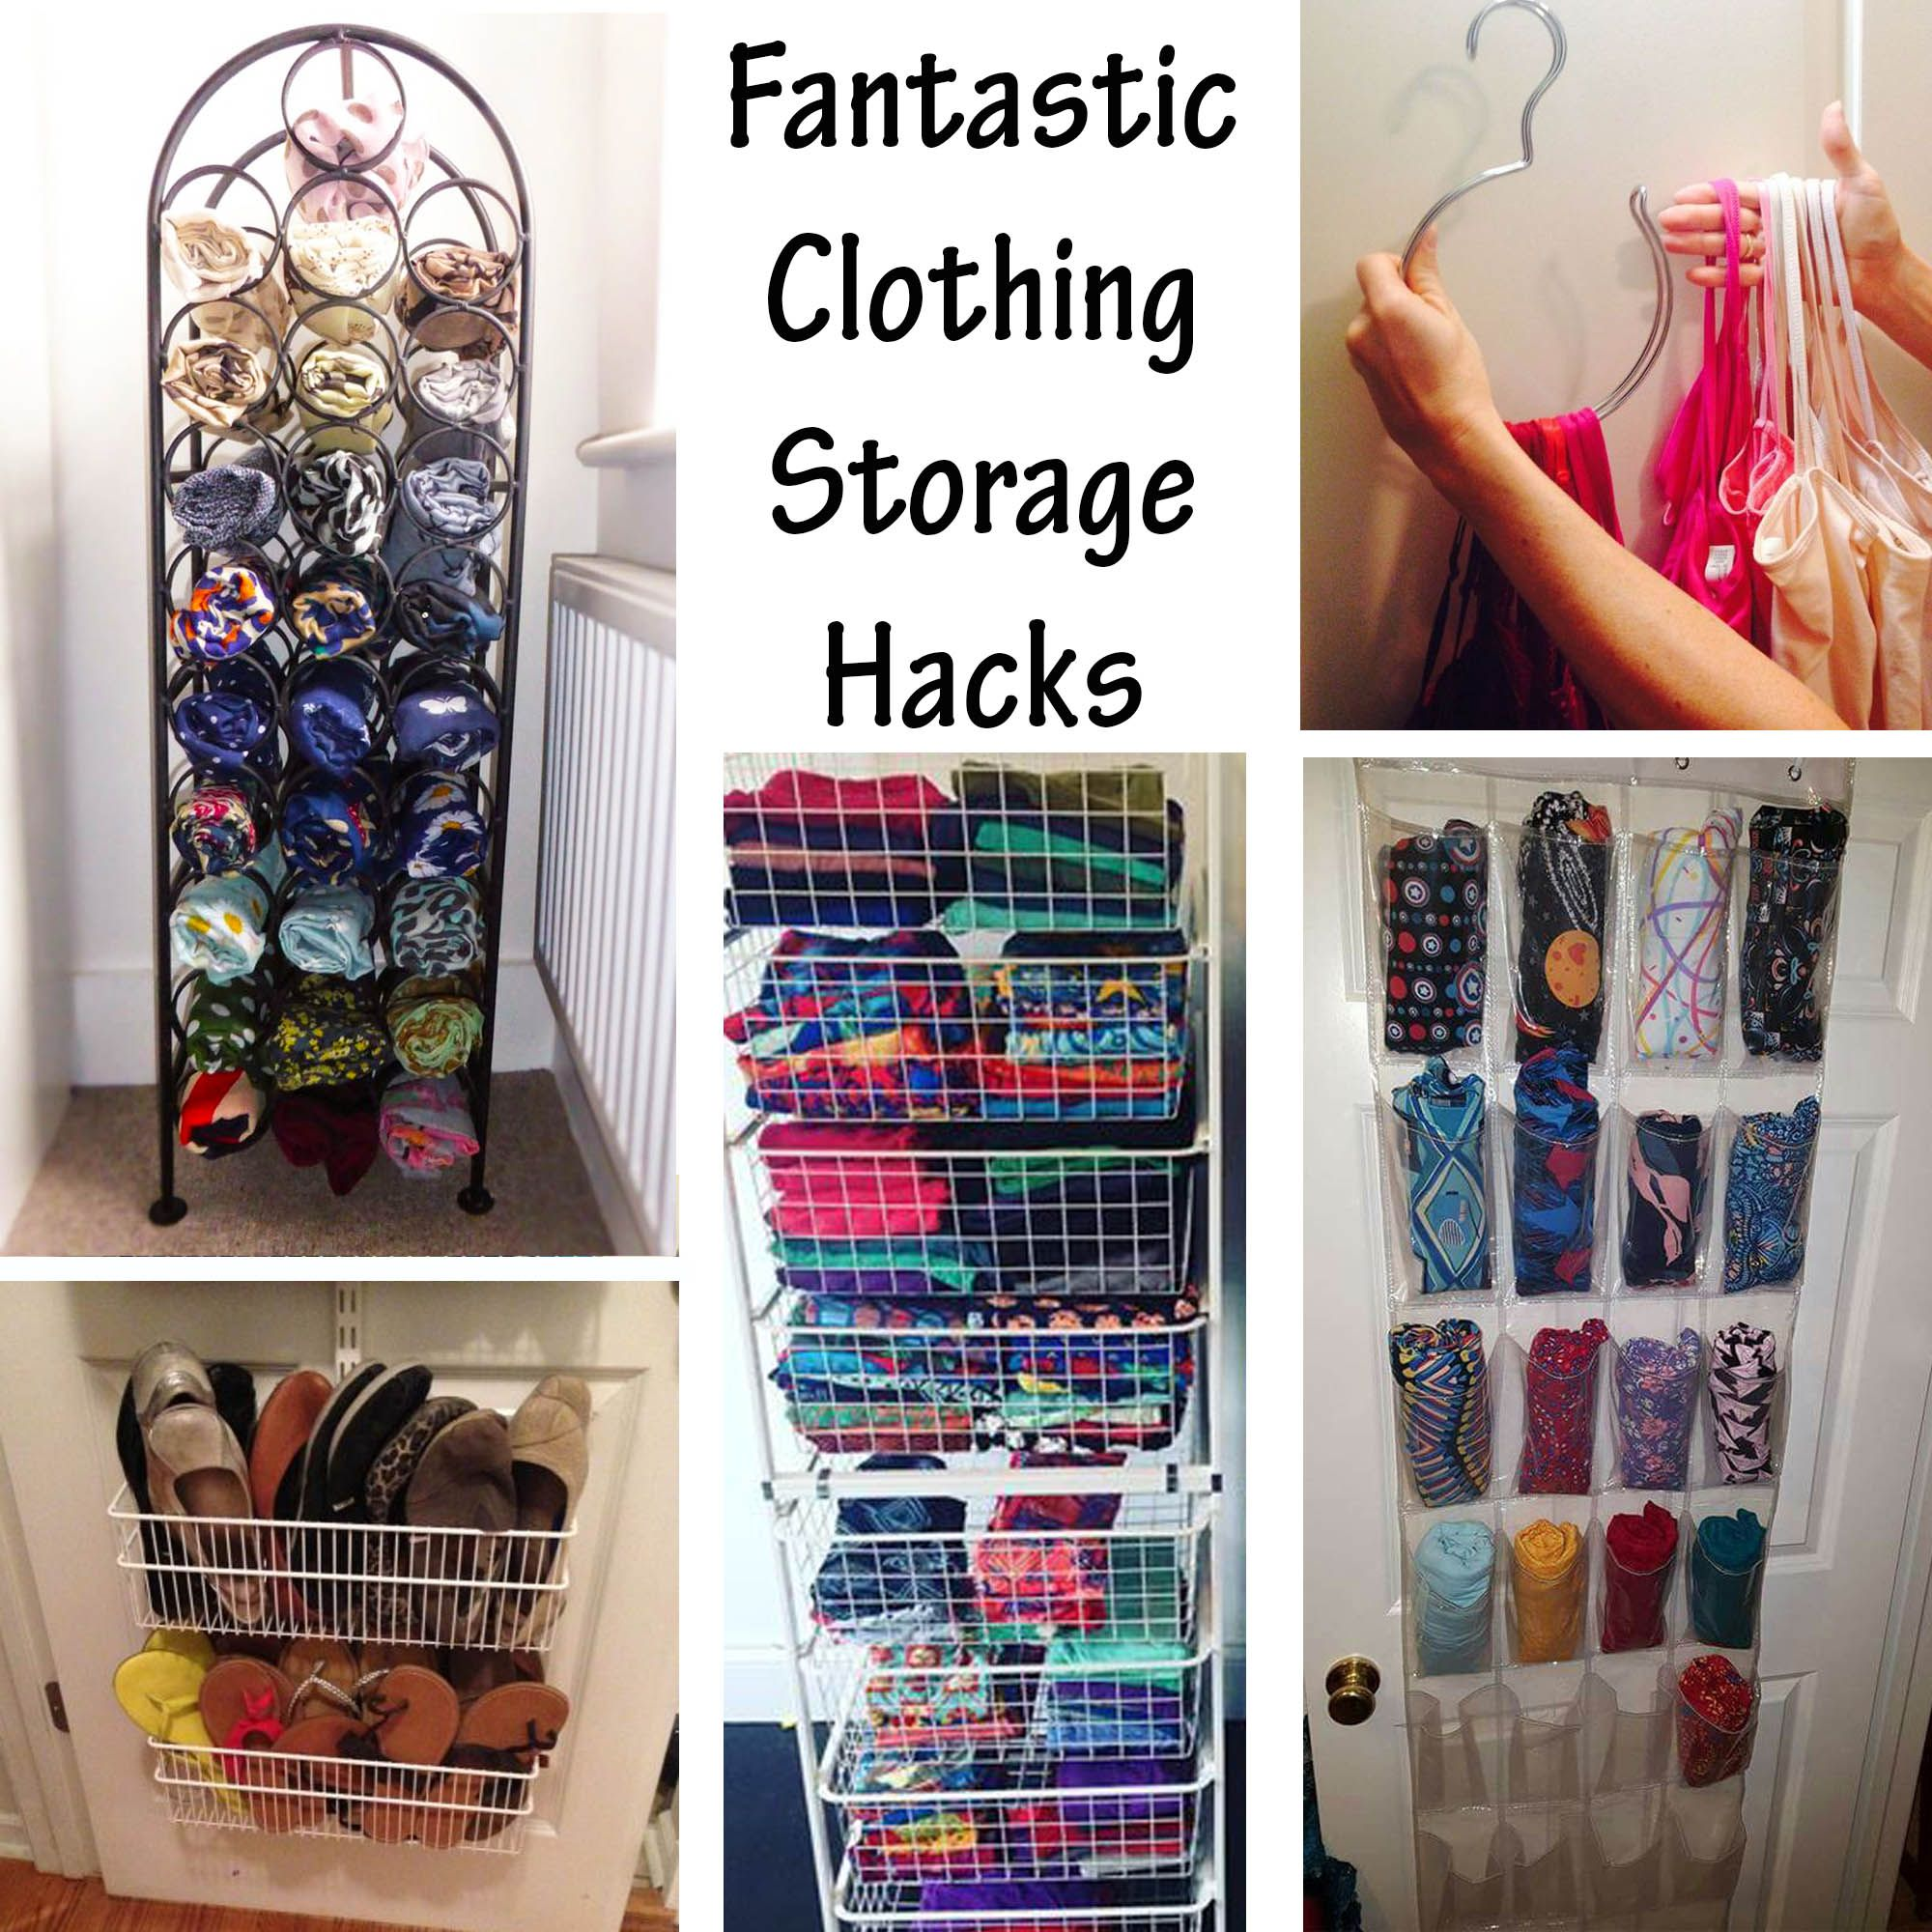 Best Fantastic Clothing Storage Hacks Bedroom Storage Ideas 400 x 300